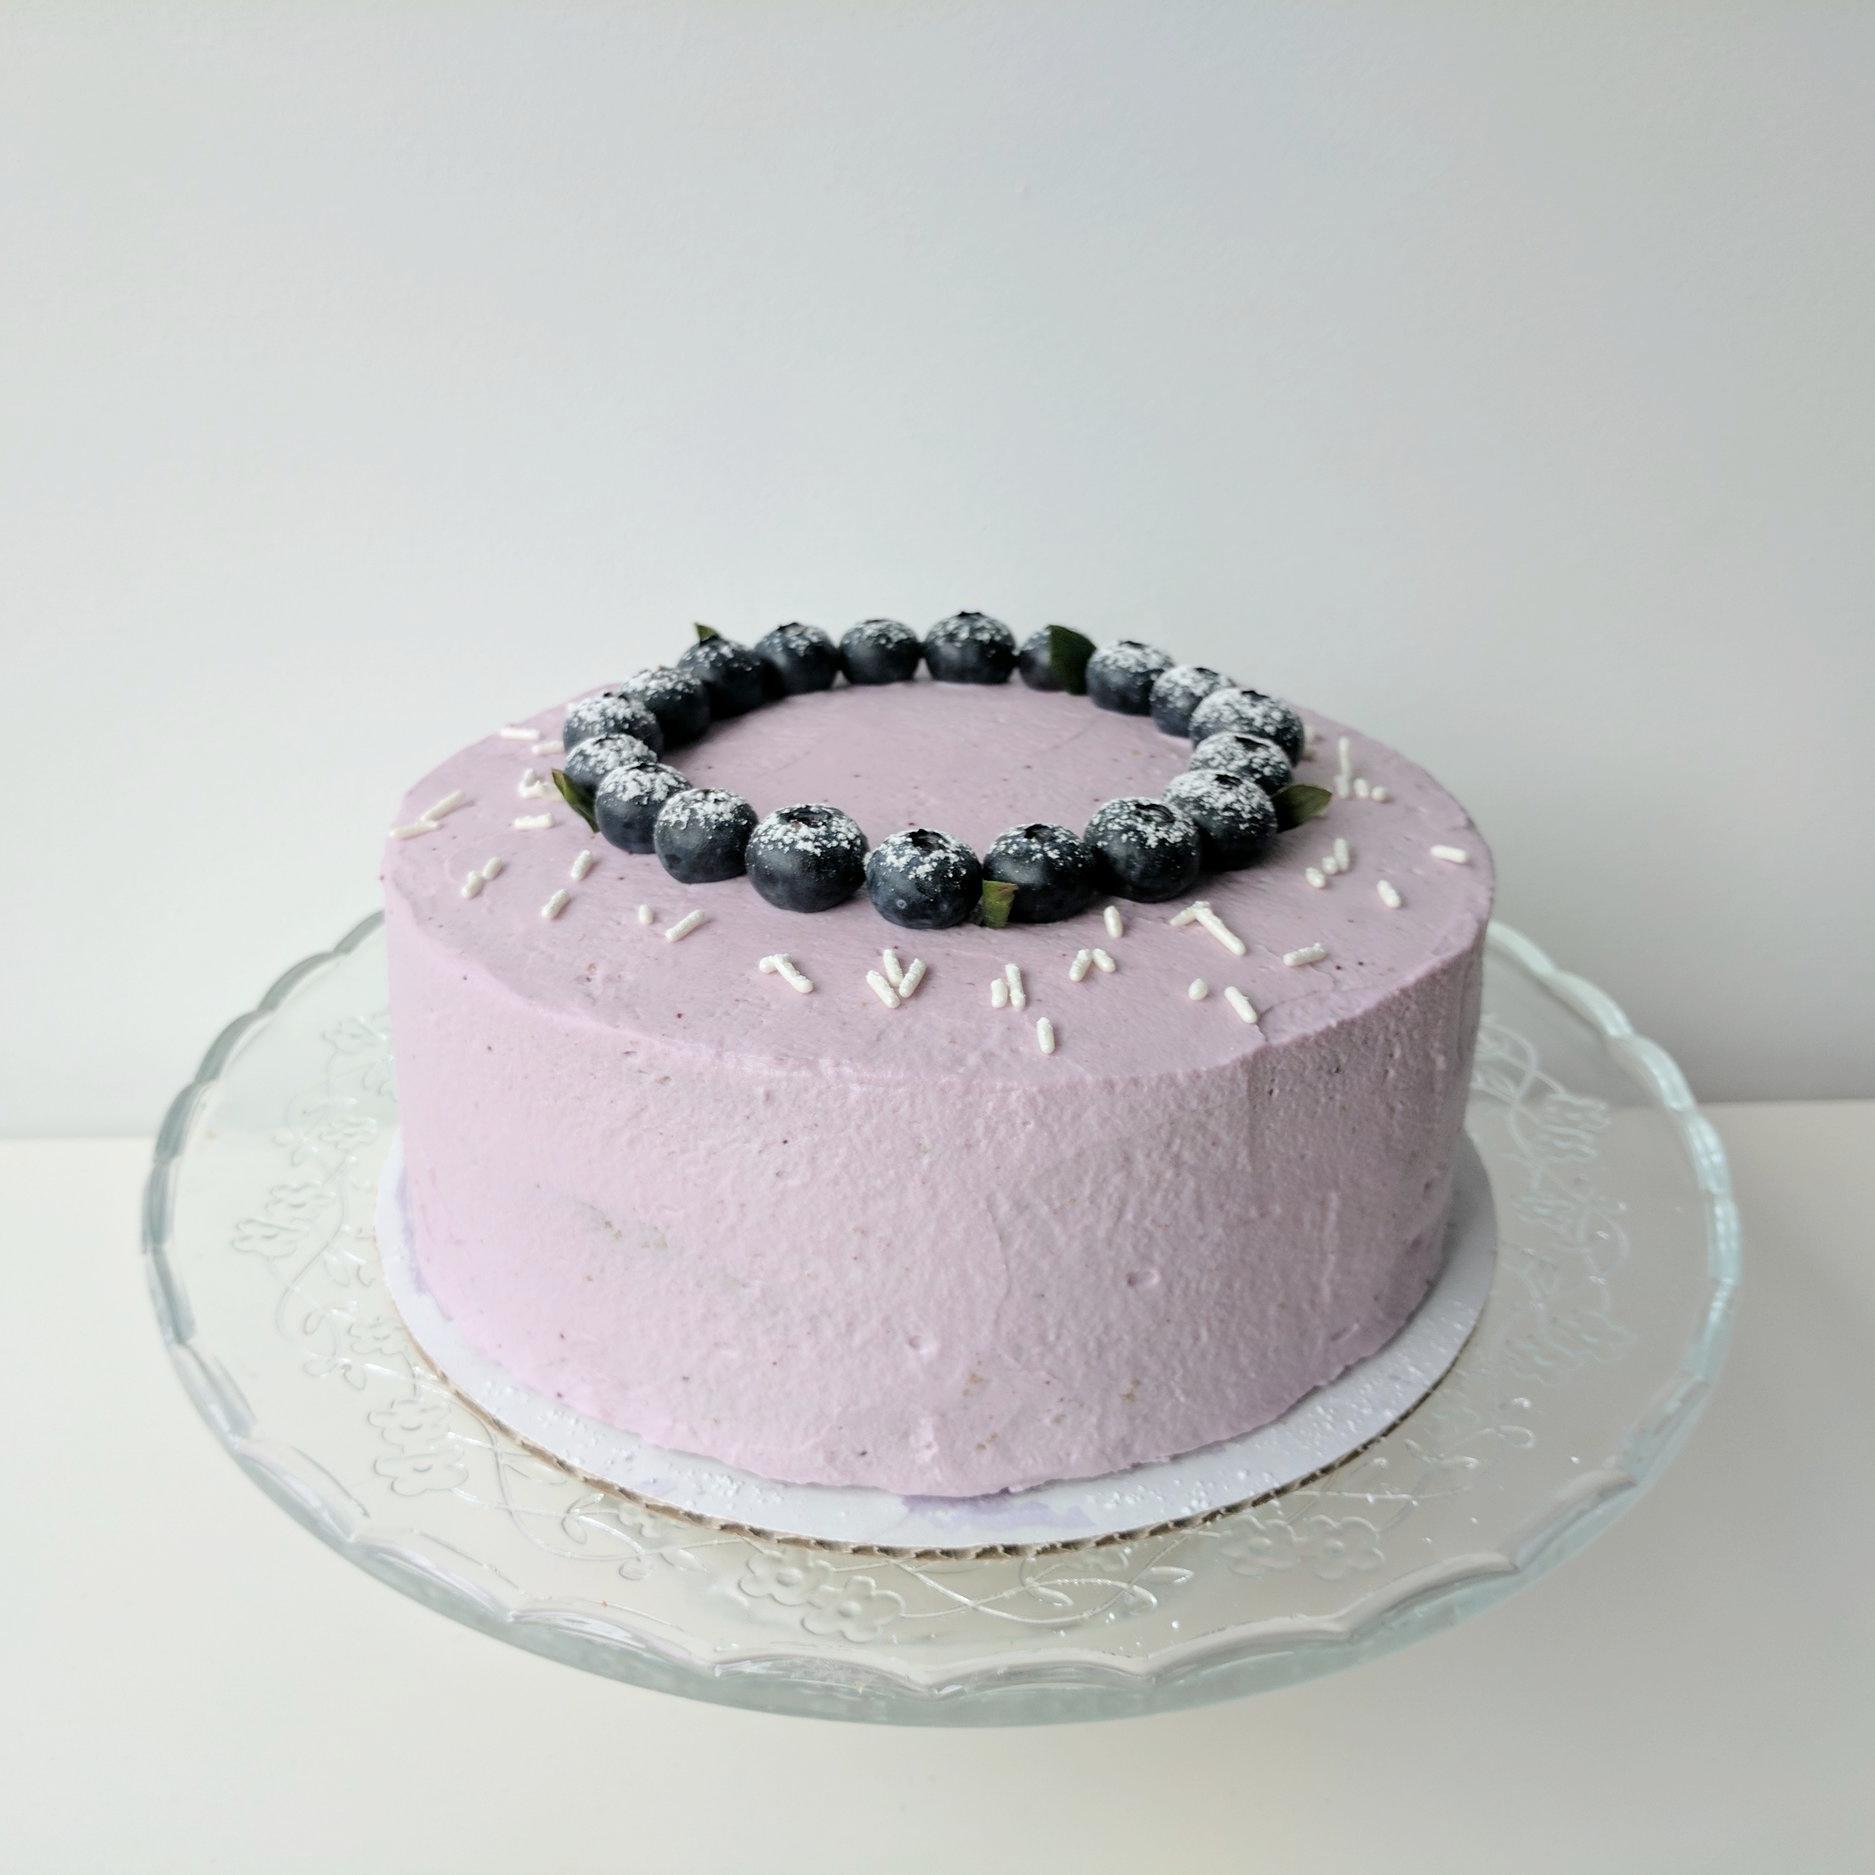 "Displayed image of a 7"" cake."